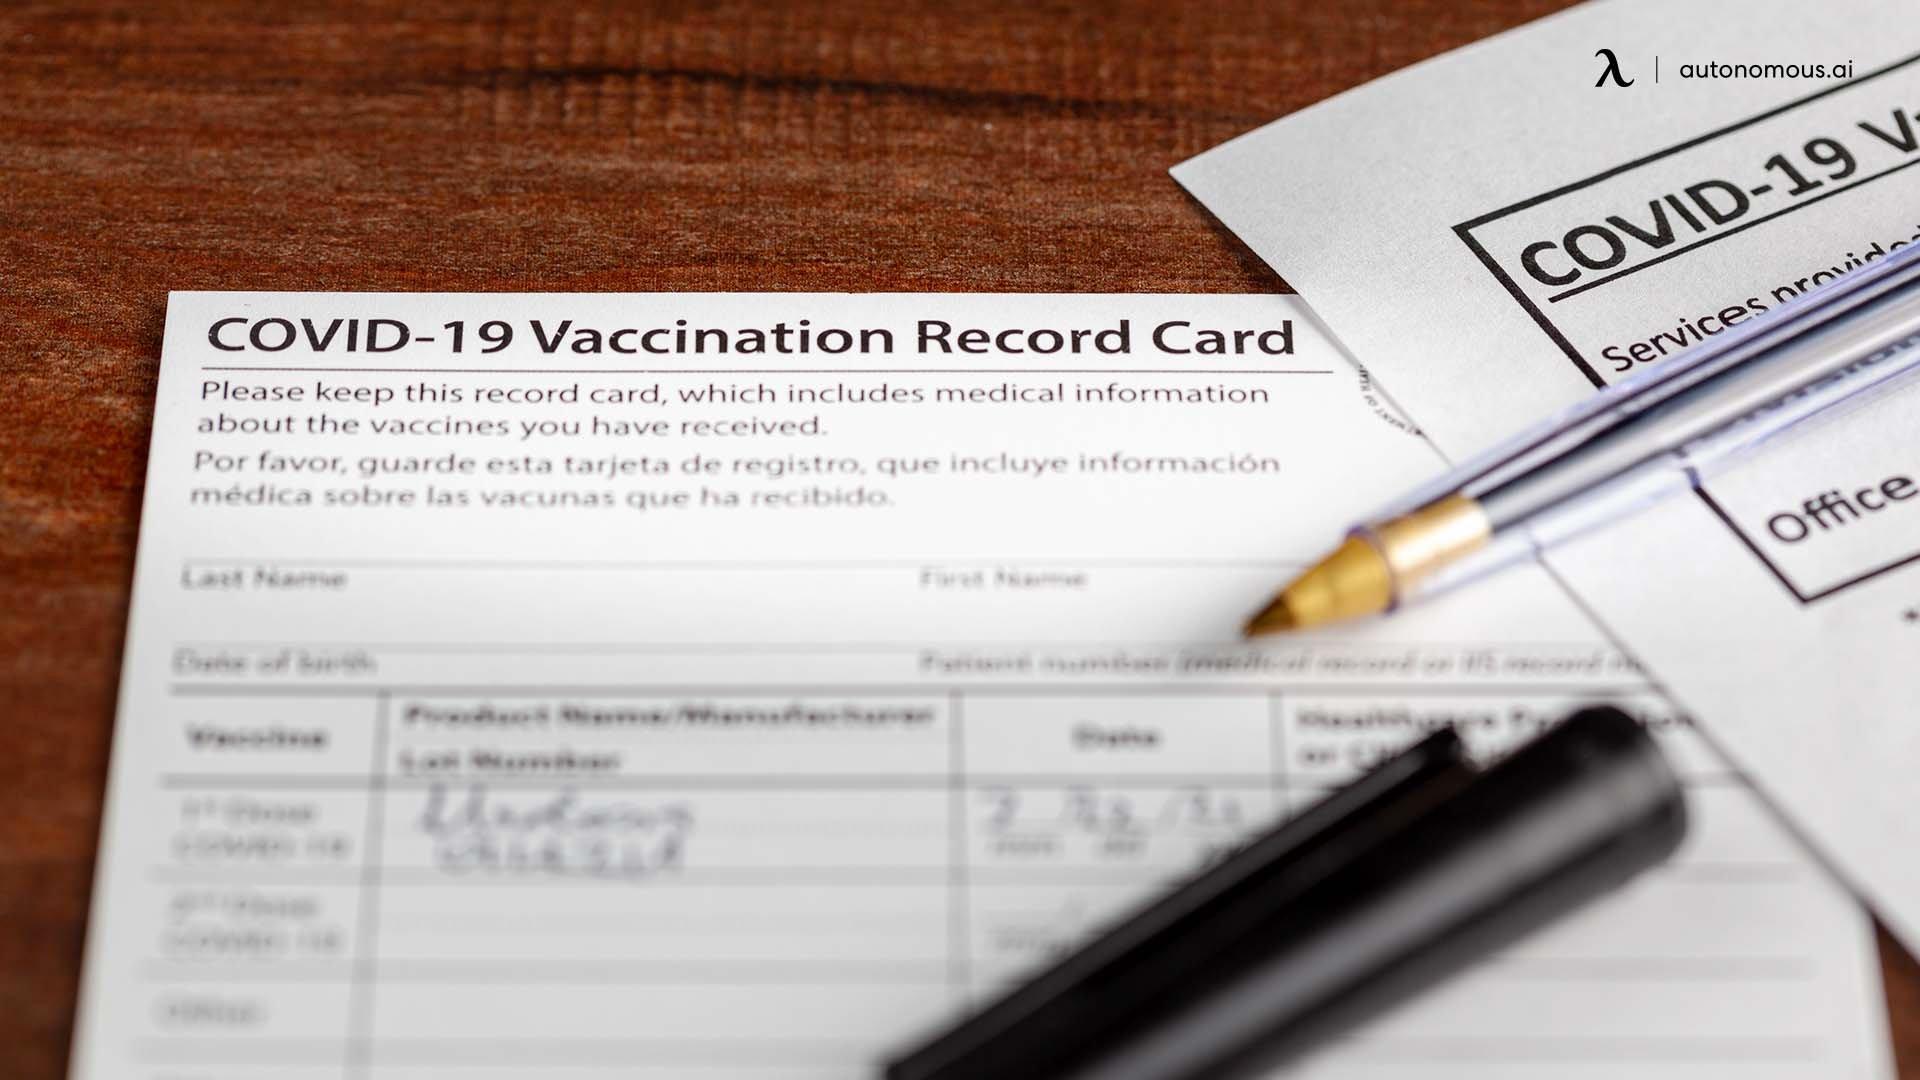 Vaccination details